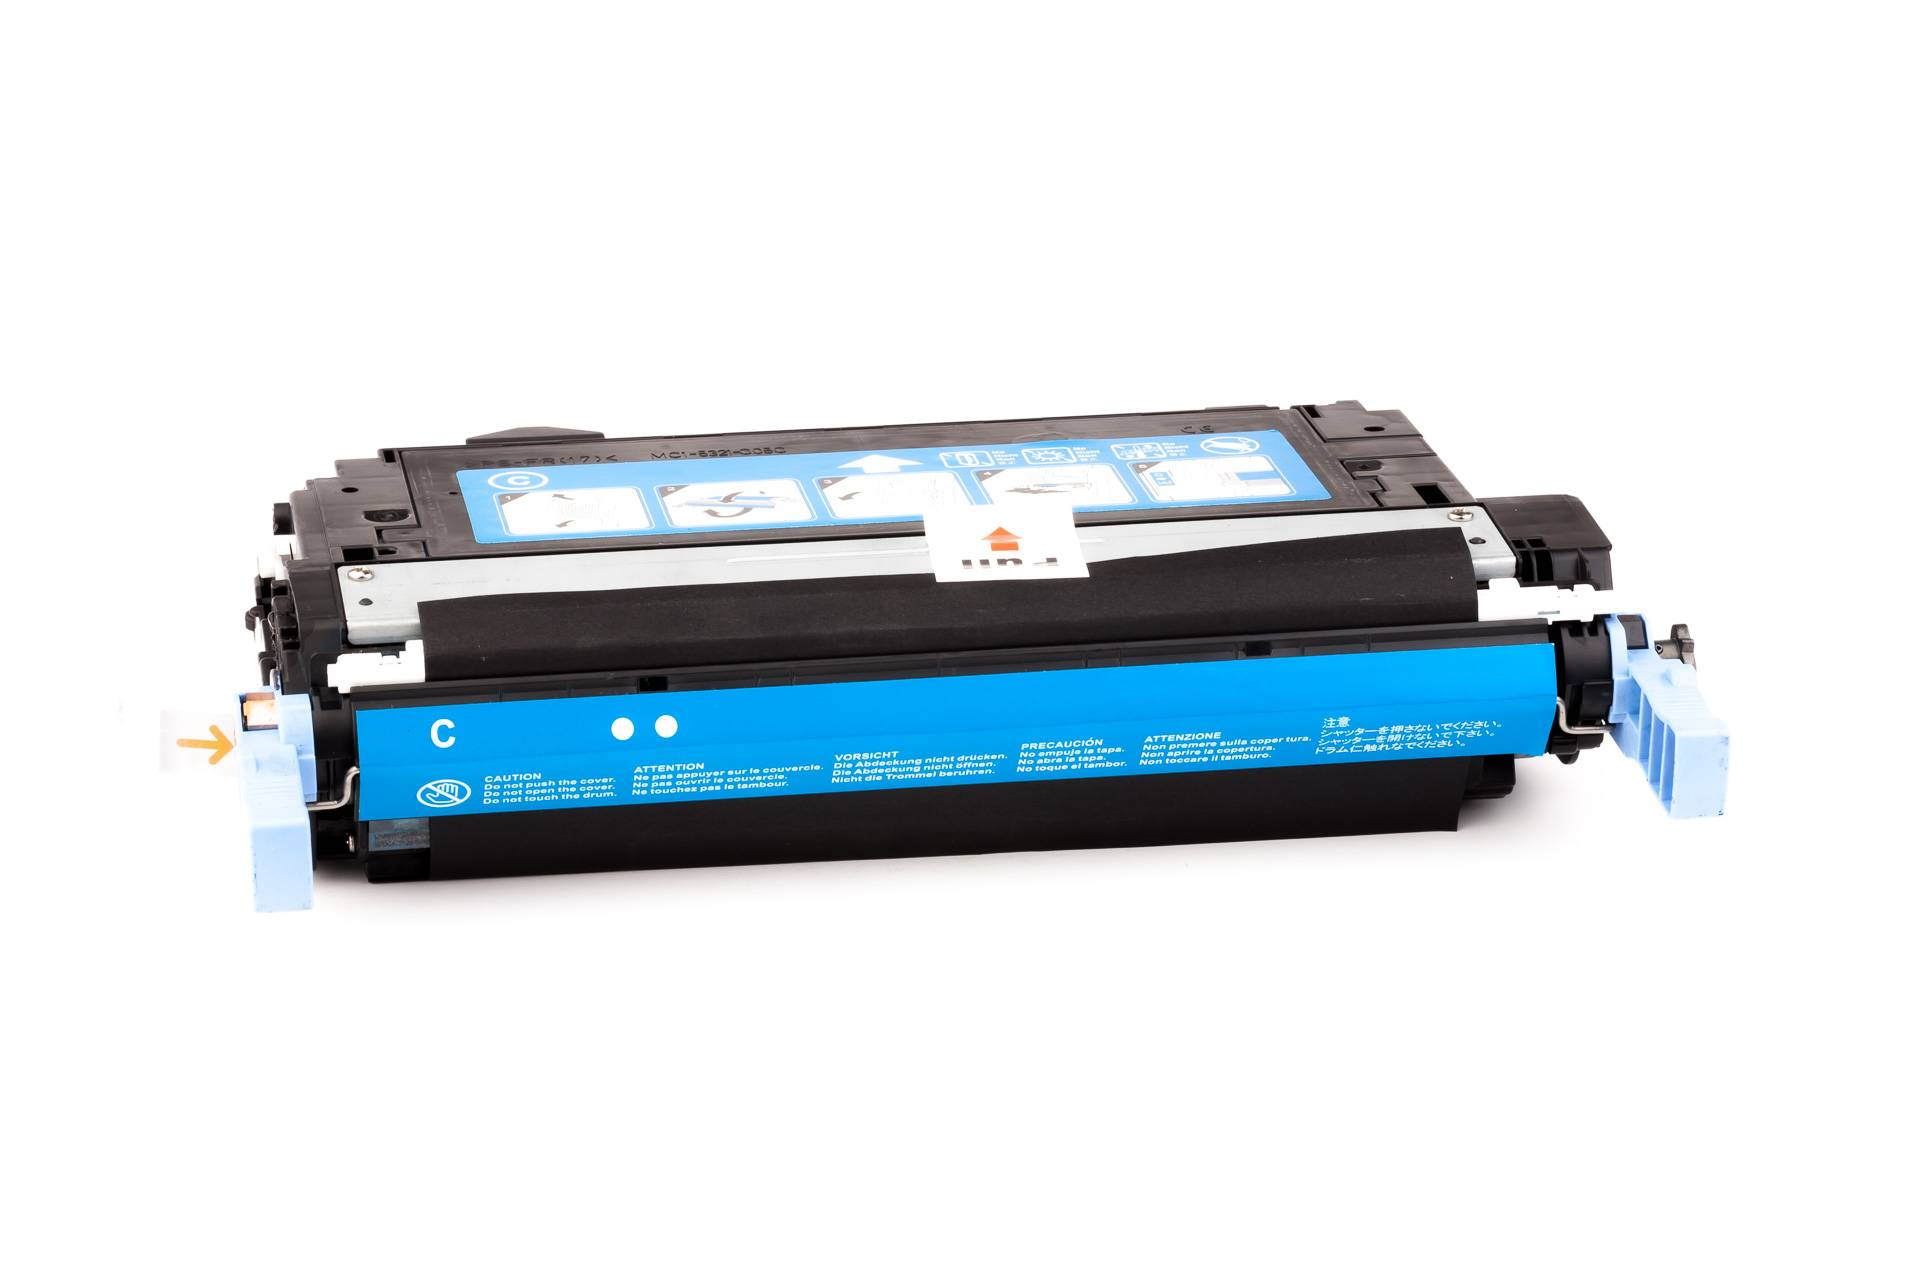 HP Cartouche de Toner pour HP CB401A / 642A cyan compatible (de marque ASC)